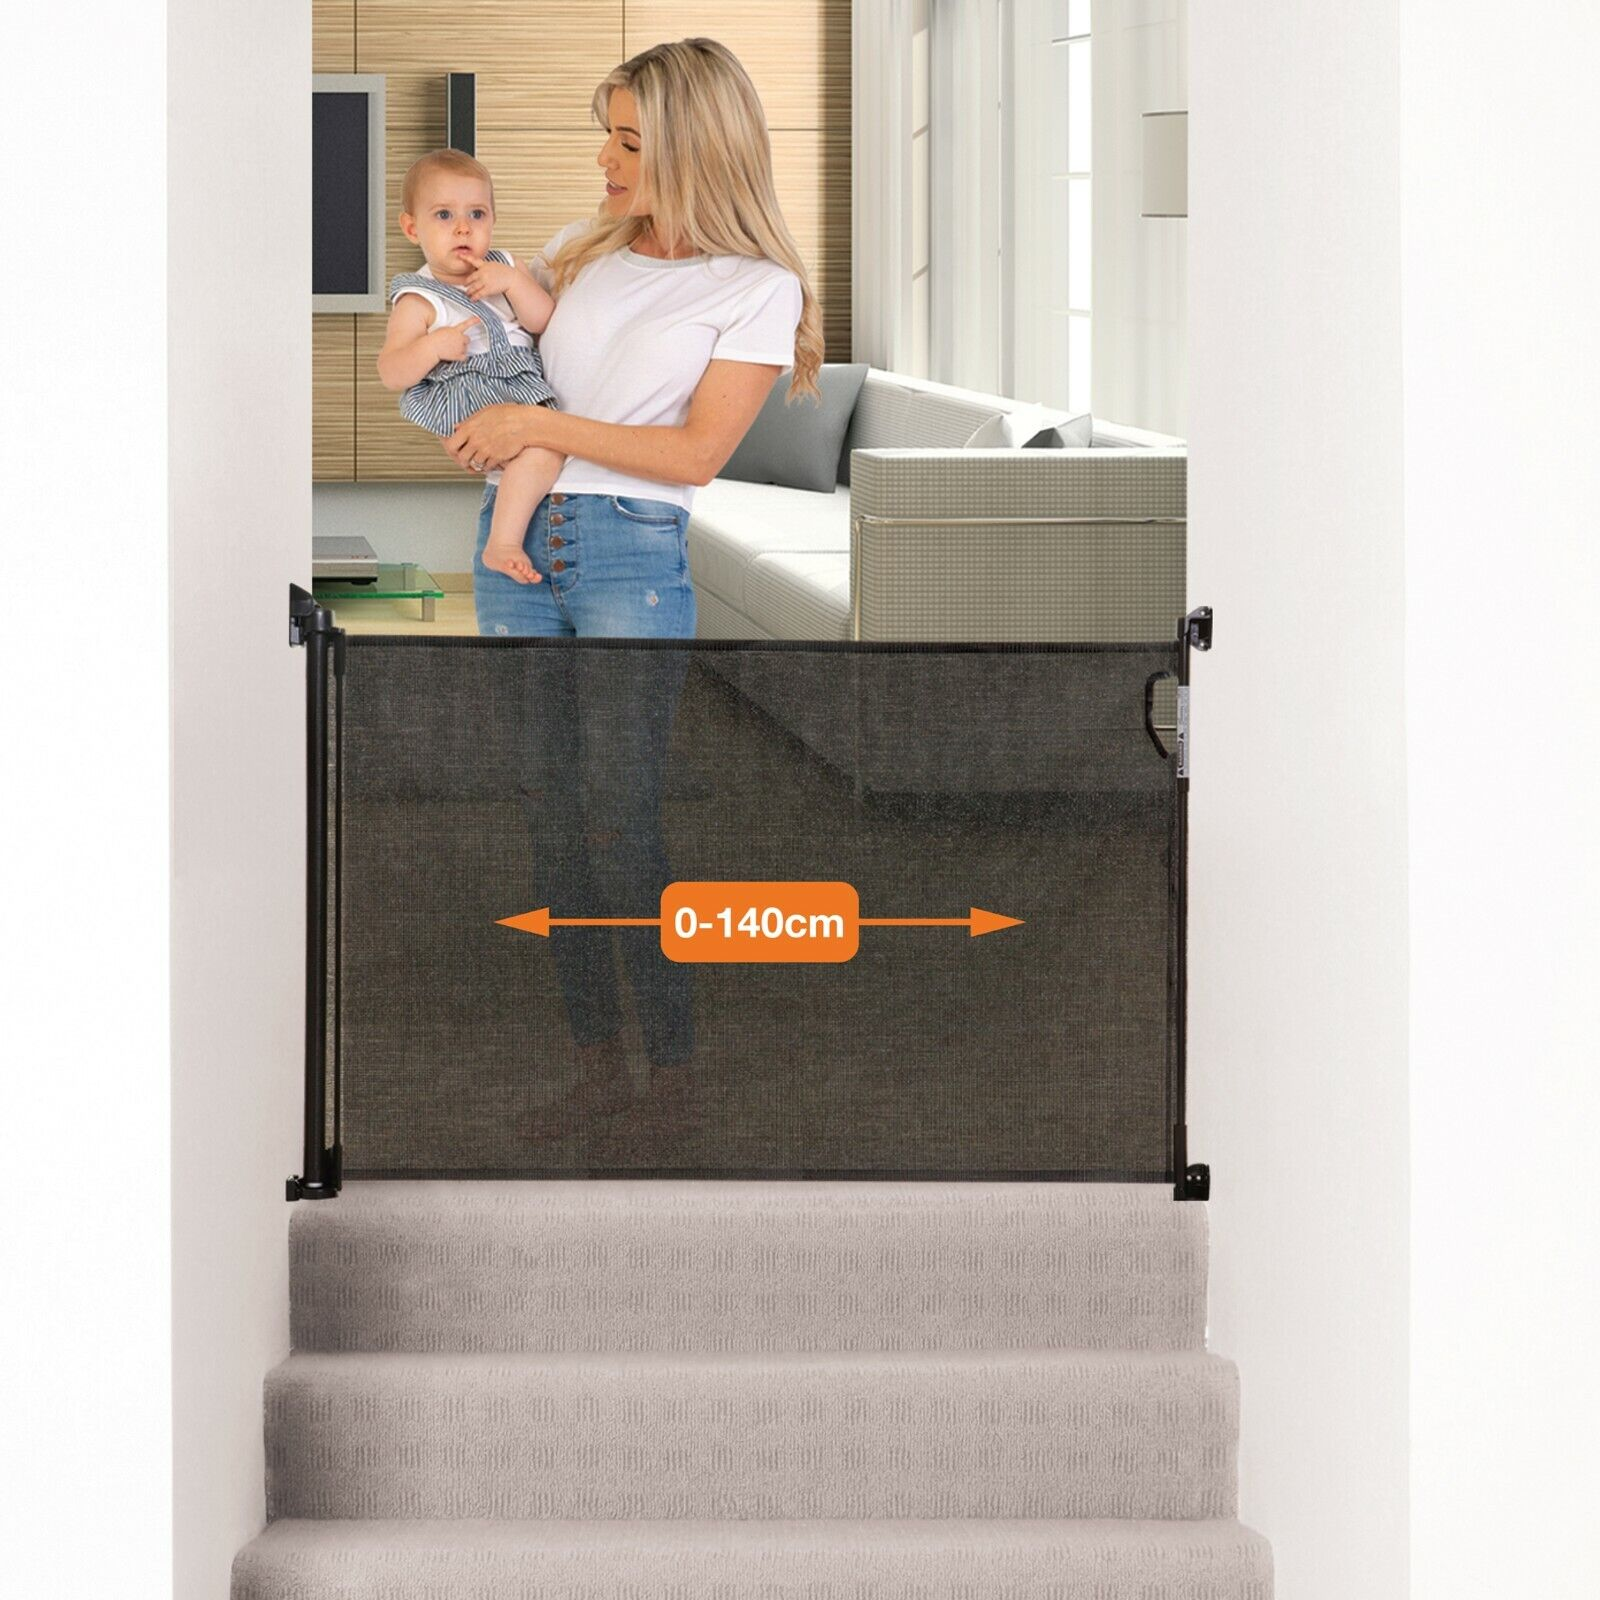 Dreambaby Retractable Mesh Safety Gate Baby Dog Pet Stair Gate 140 Cm Black 9312742894313 Ebay